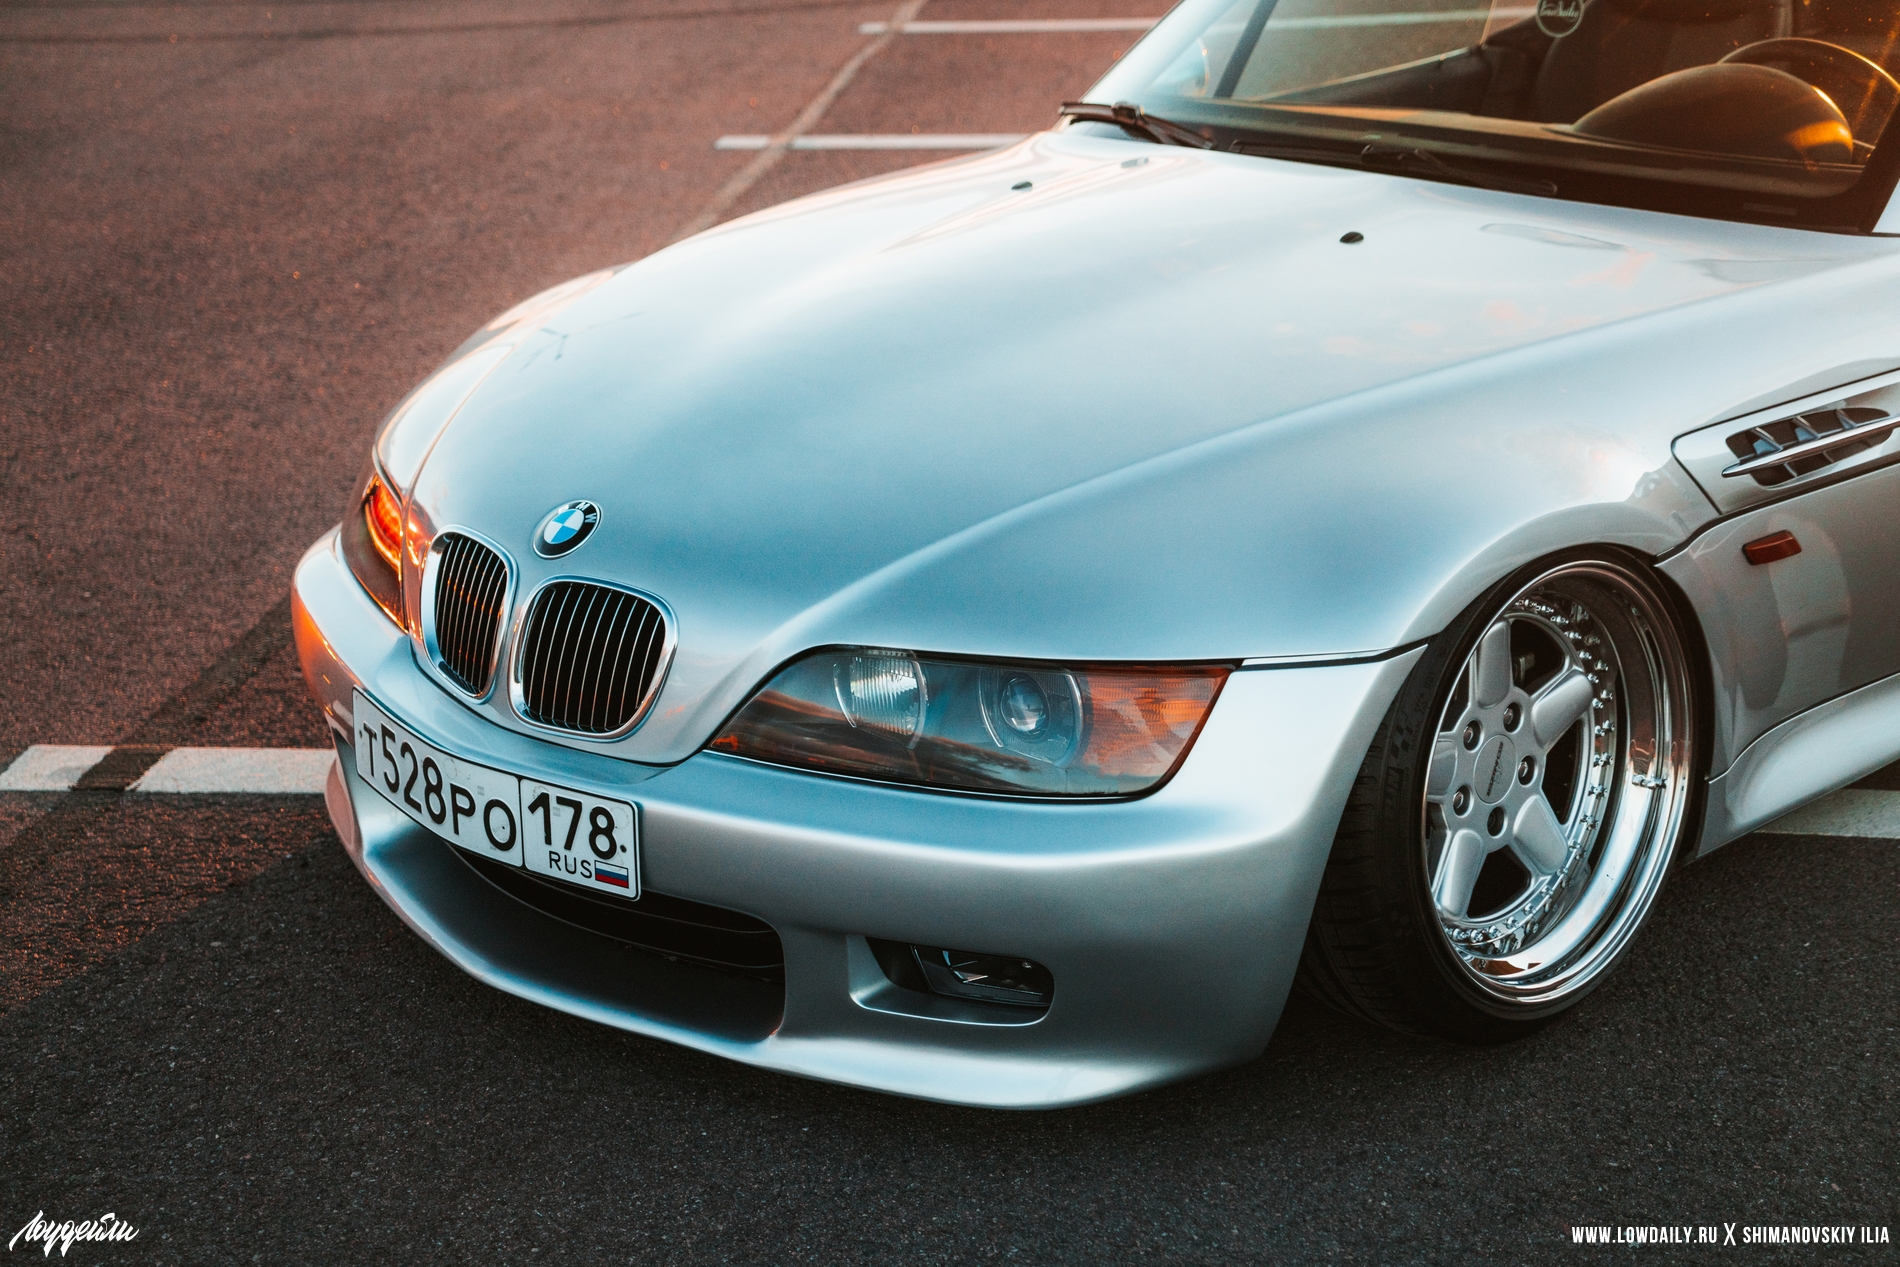 Clean look stance OEM BMW Z3 Roadster - Saint-P.